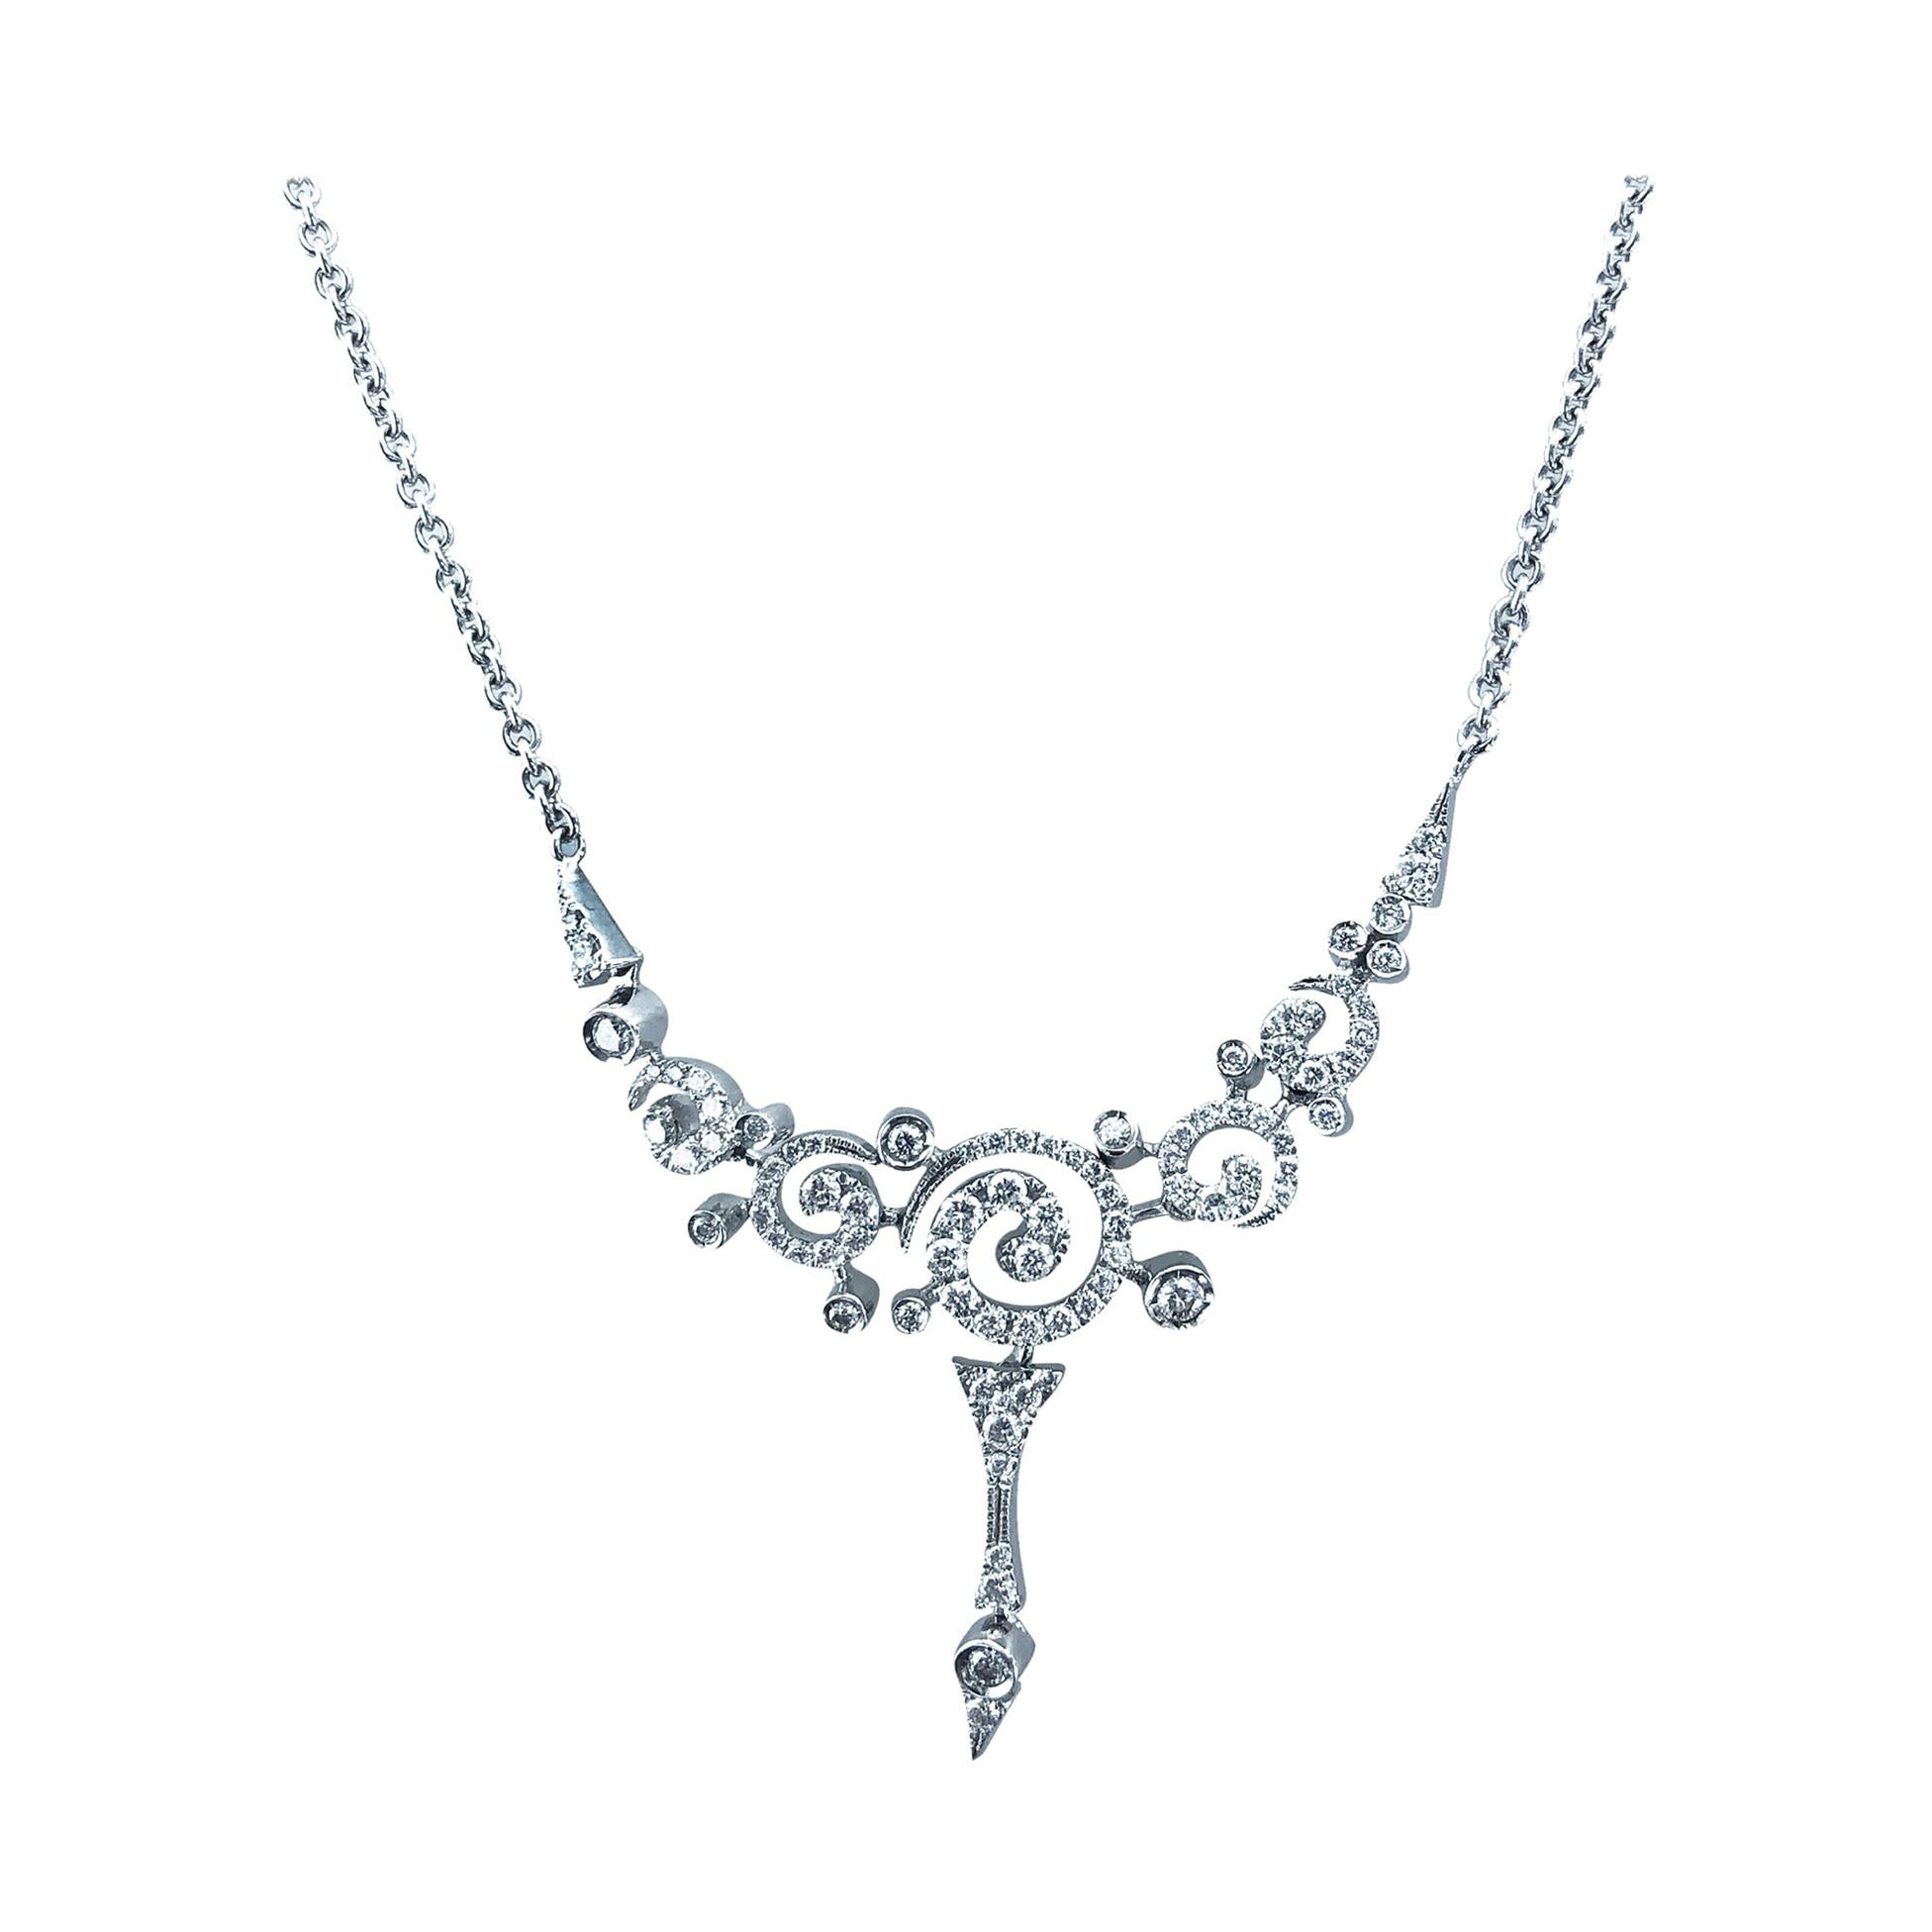 Stefan Hafner 1.15 Carats, 18kt White Gold Mini Swirl Diamond Necklace